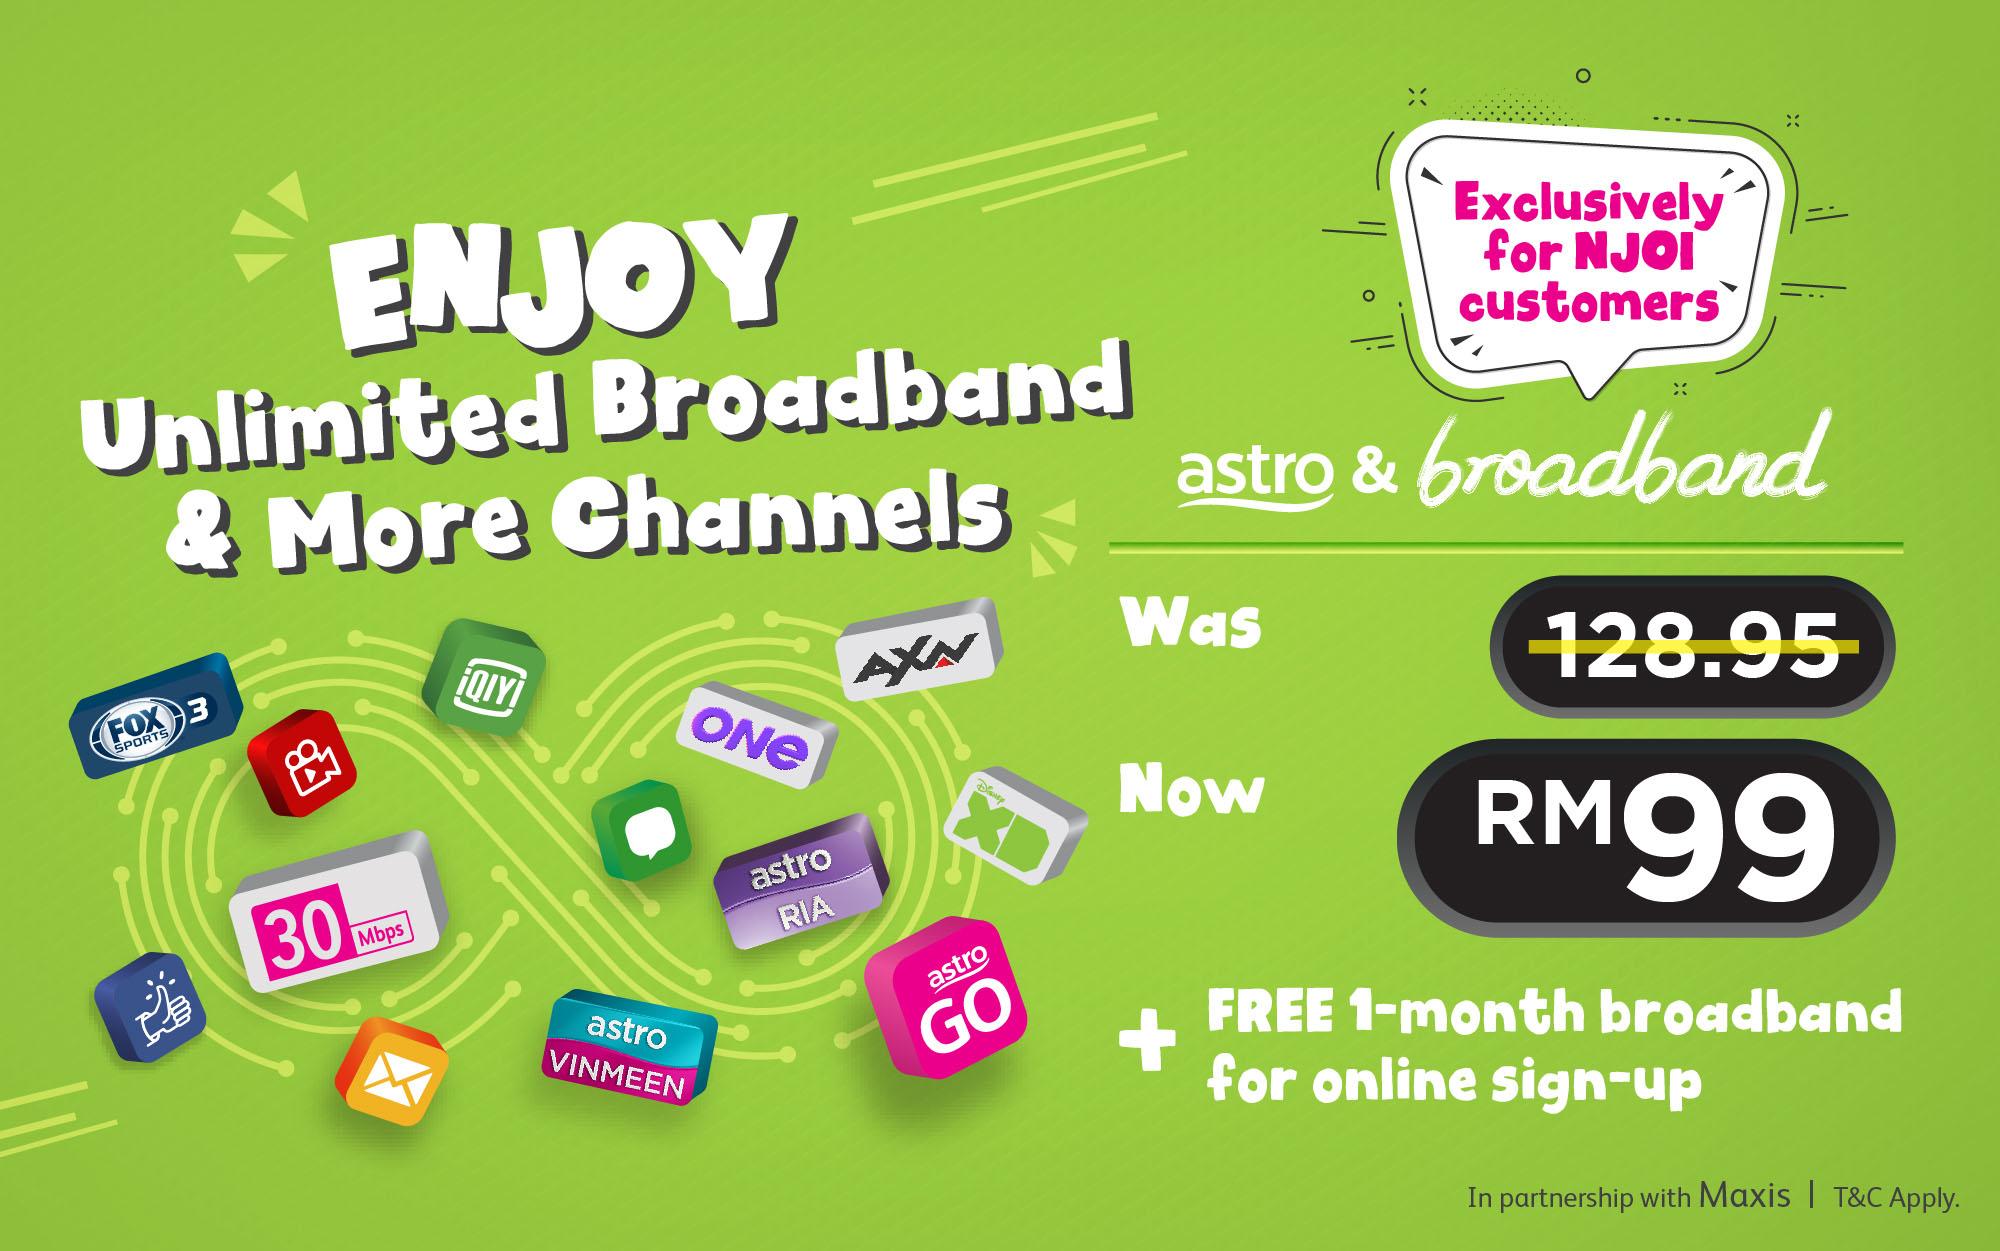 RM99/mth for Astro & Broadband!